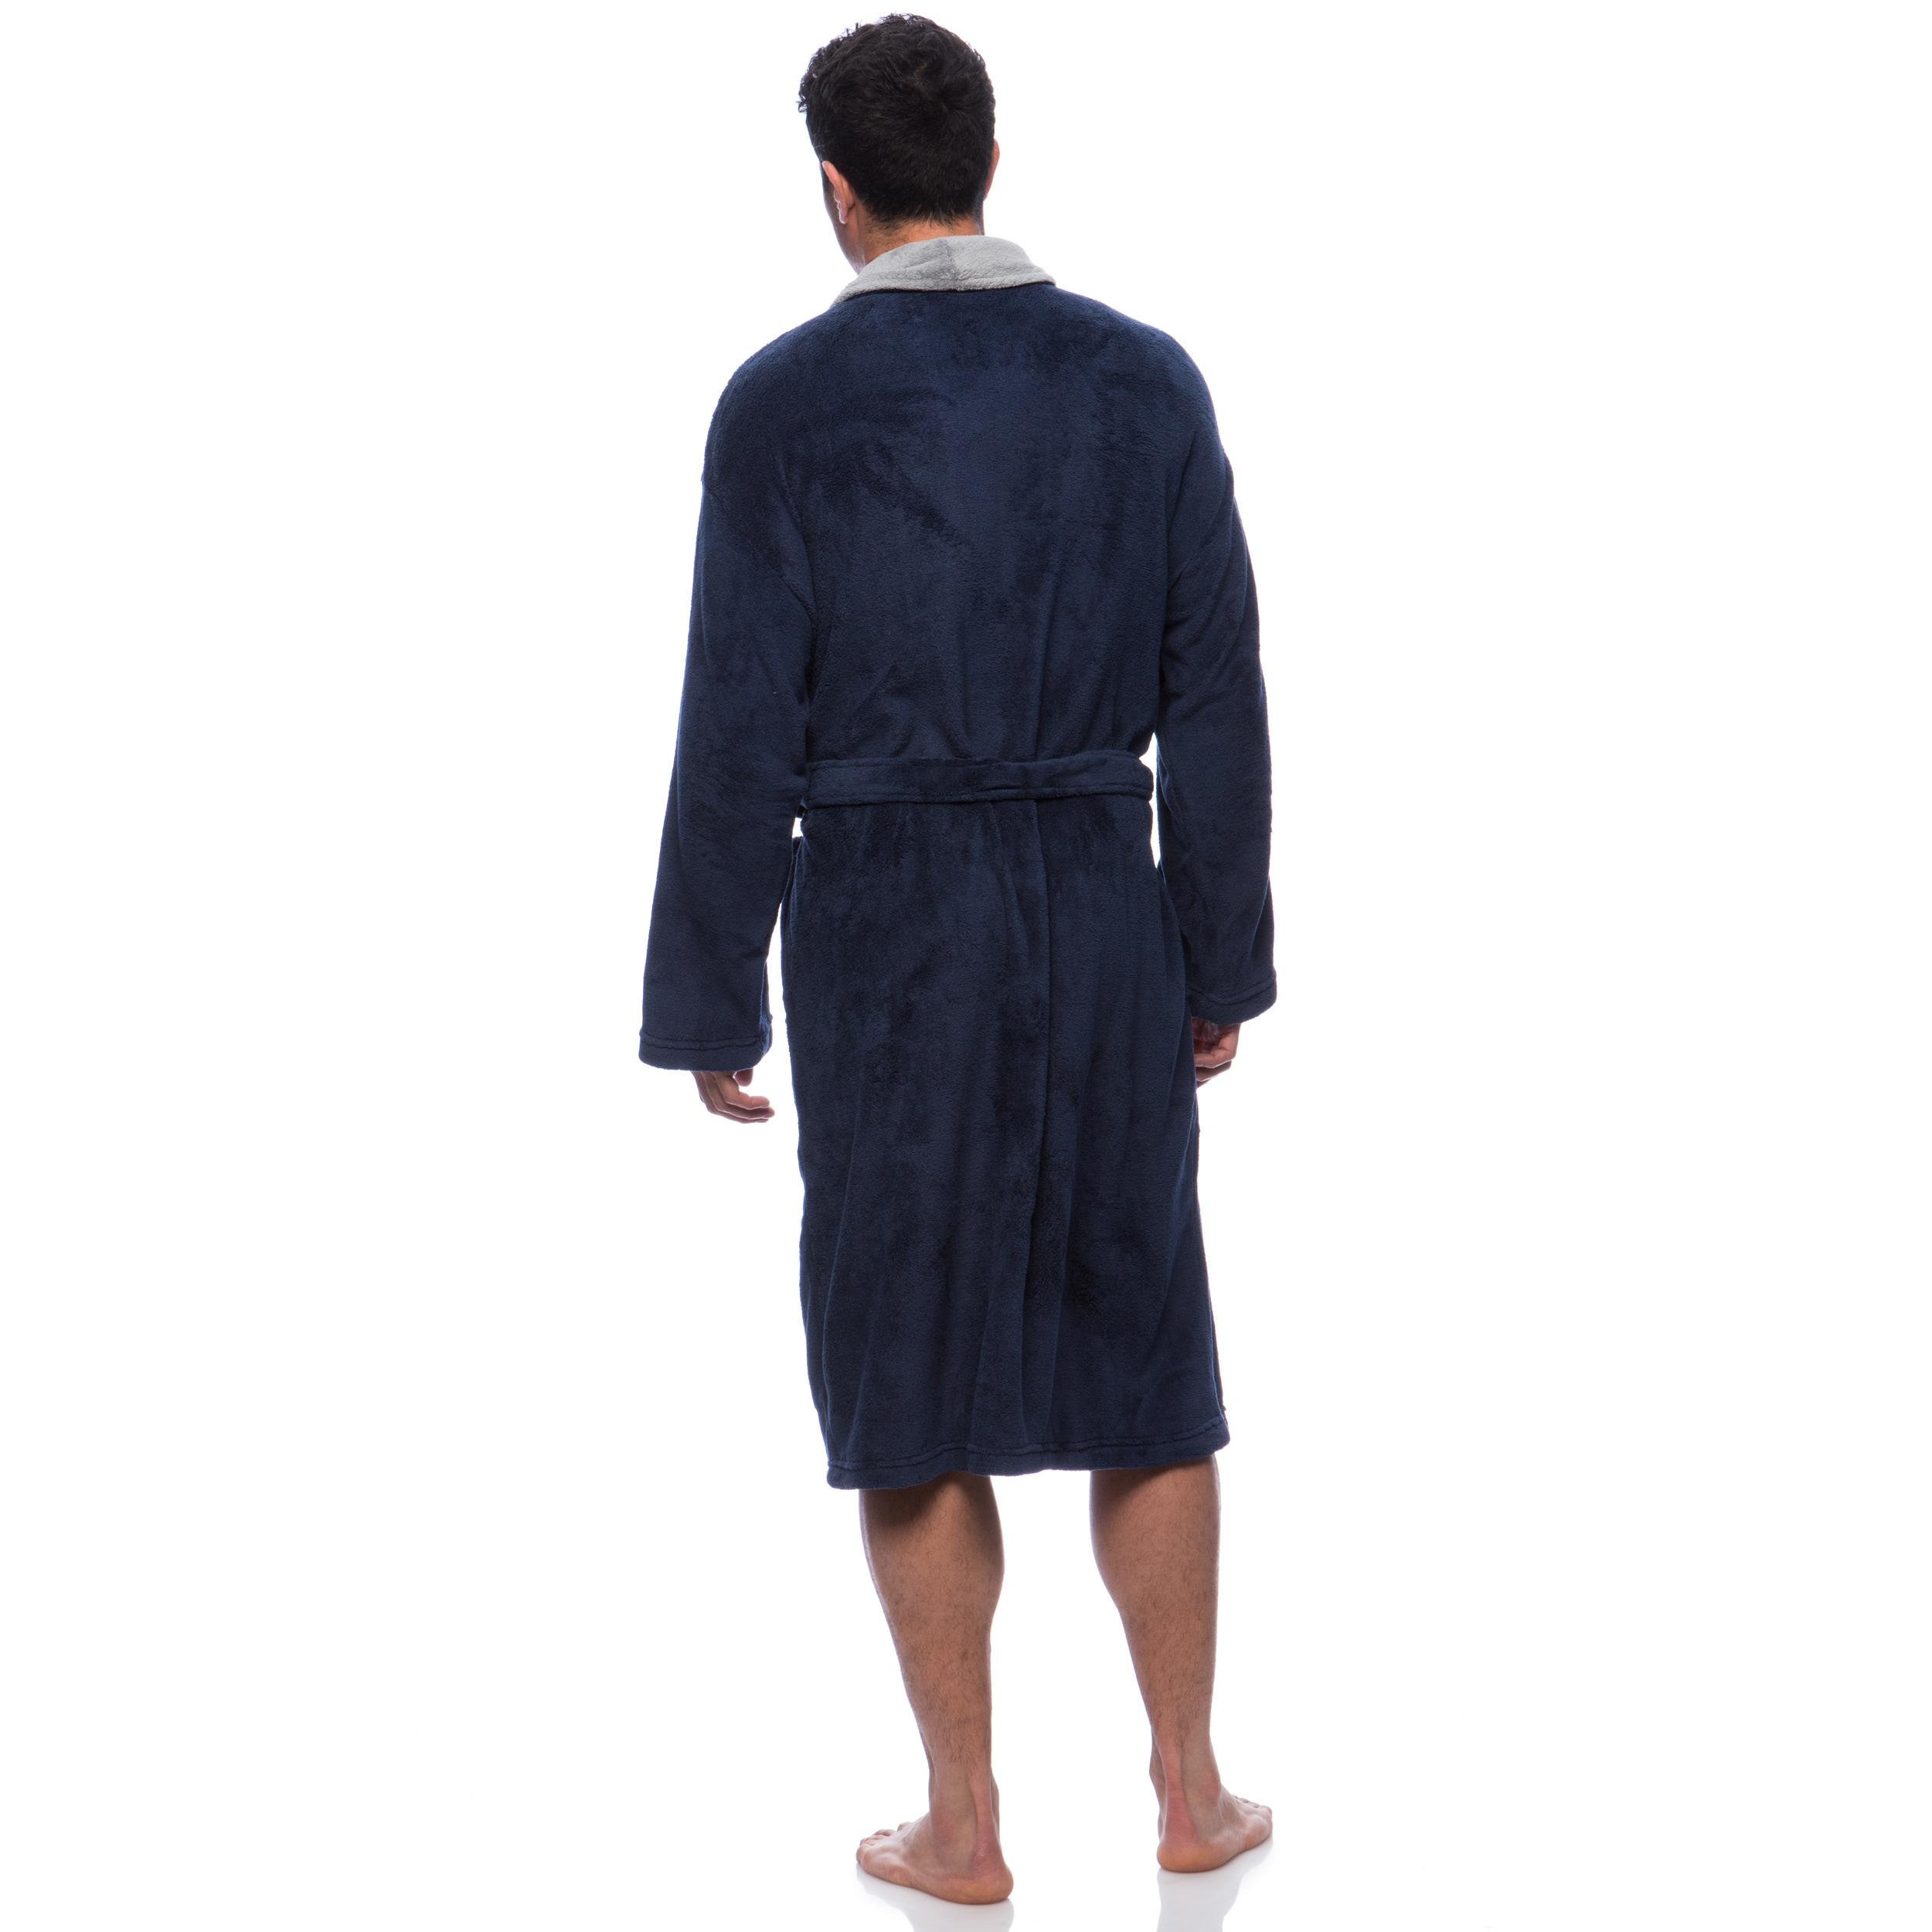 Shop Pipeline Men s Micro Plush Bath Robe - Free Shipping Today ... d5b8f7b48